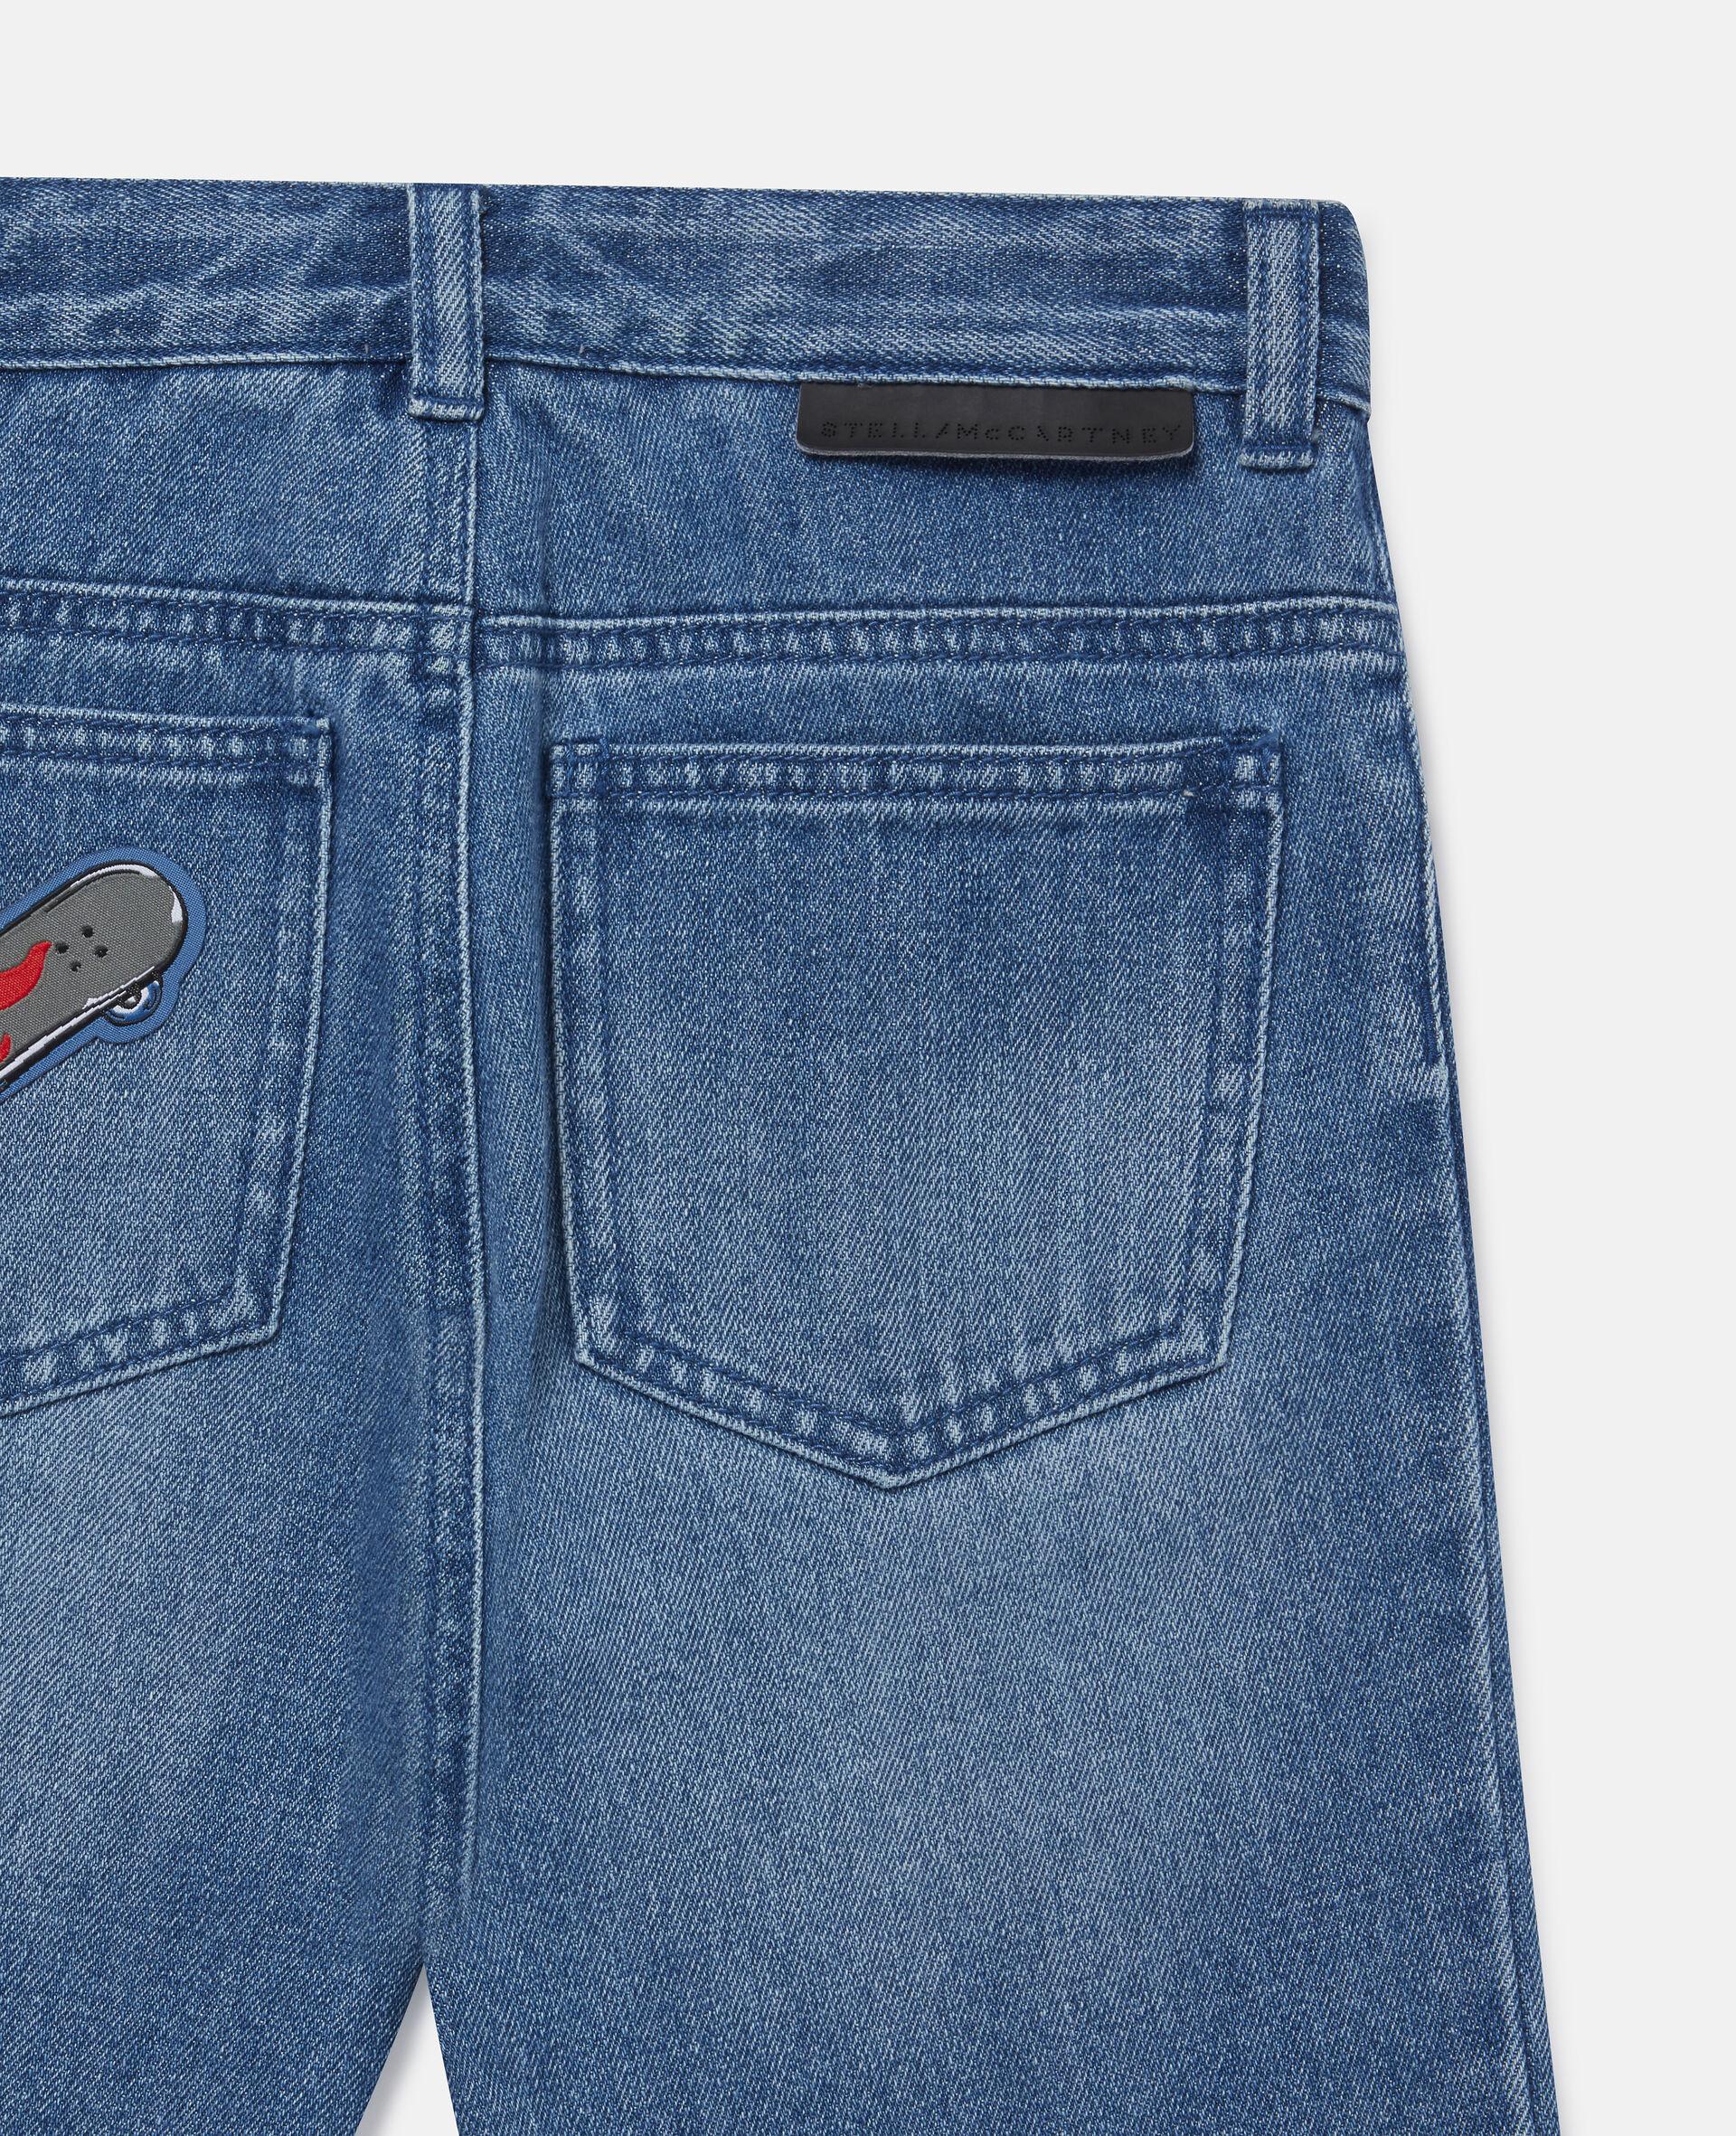 滑板徽章牛仔短裤-蓝色-large image number 2